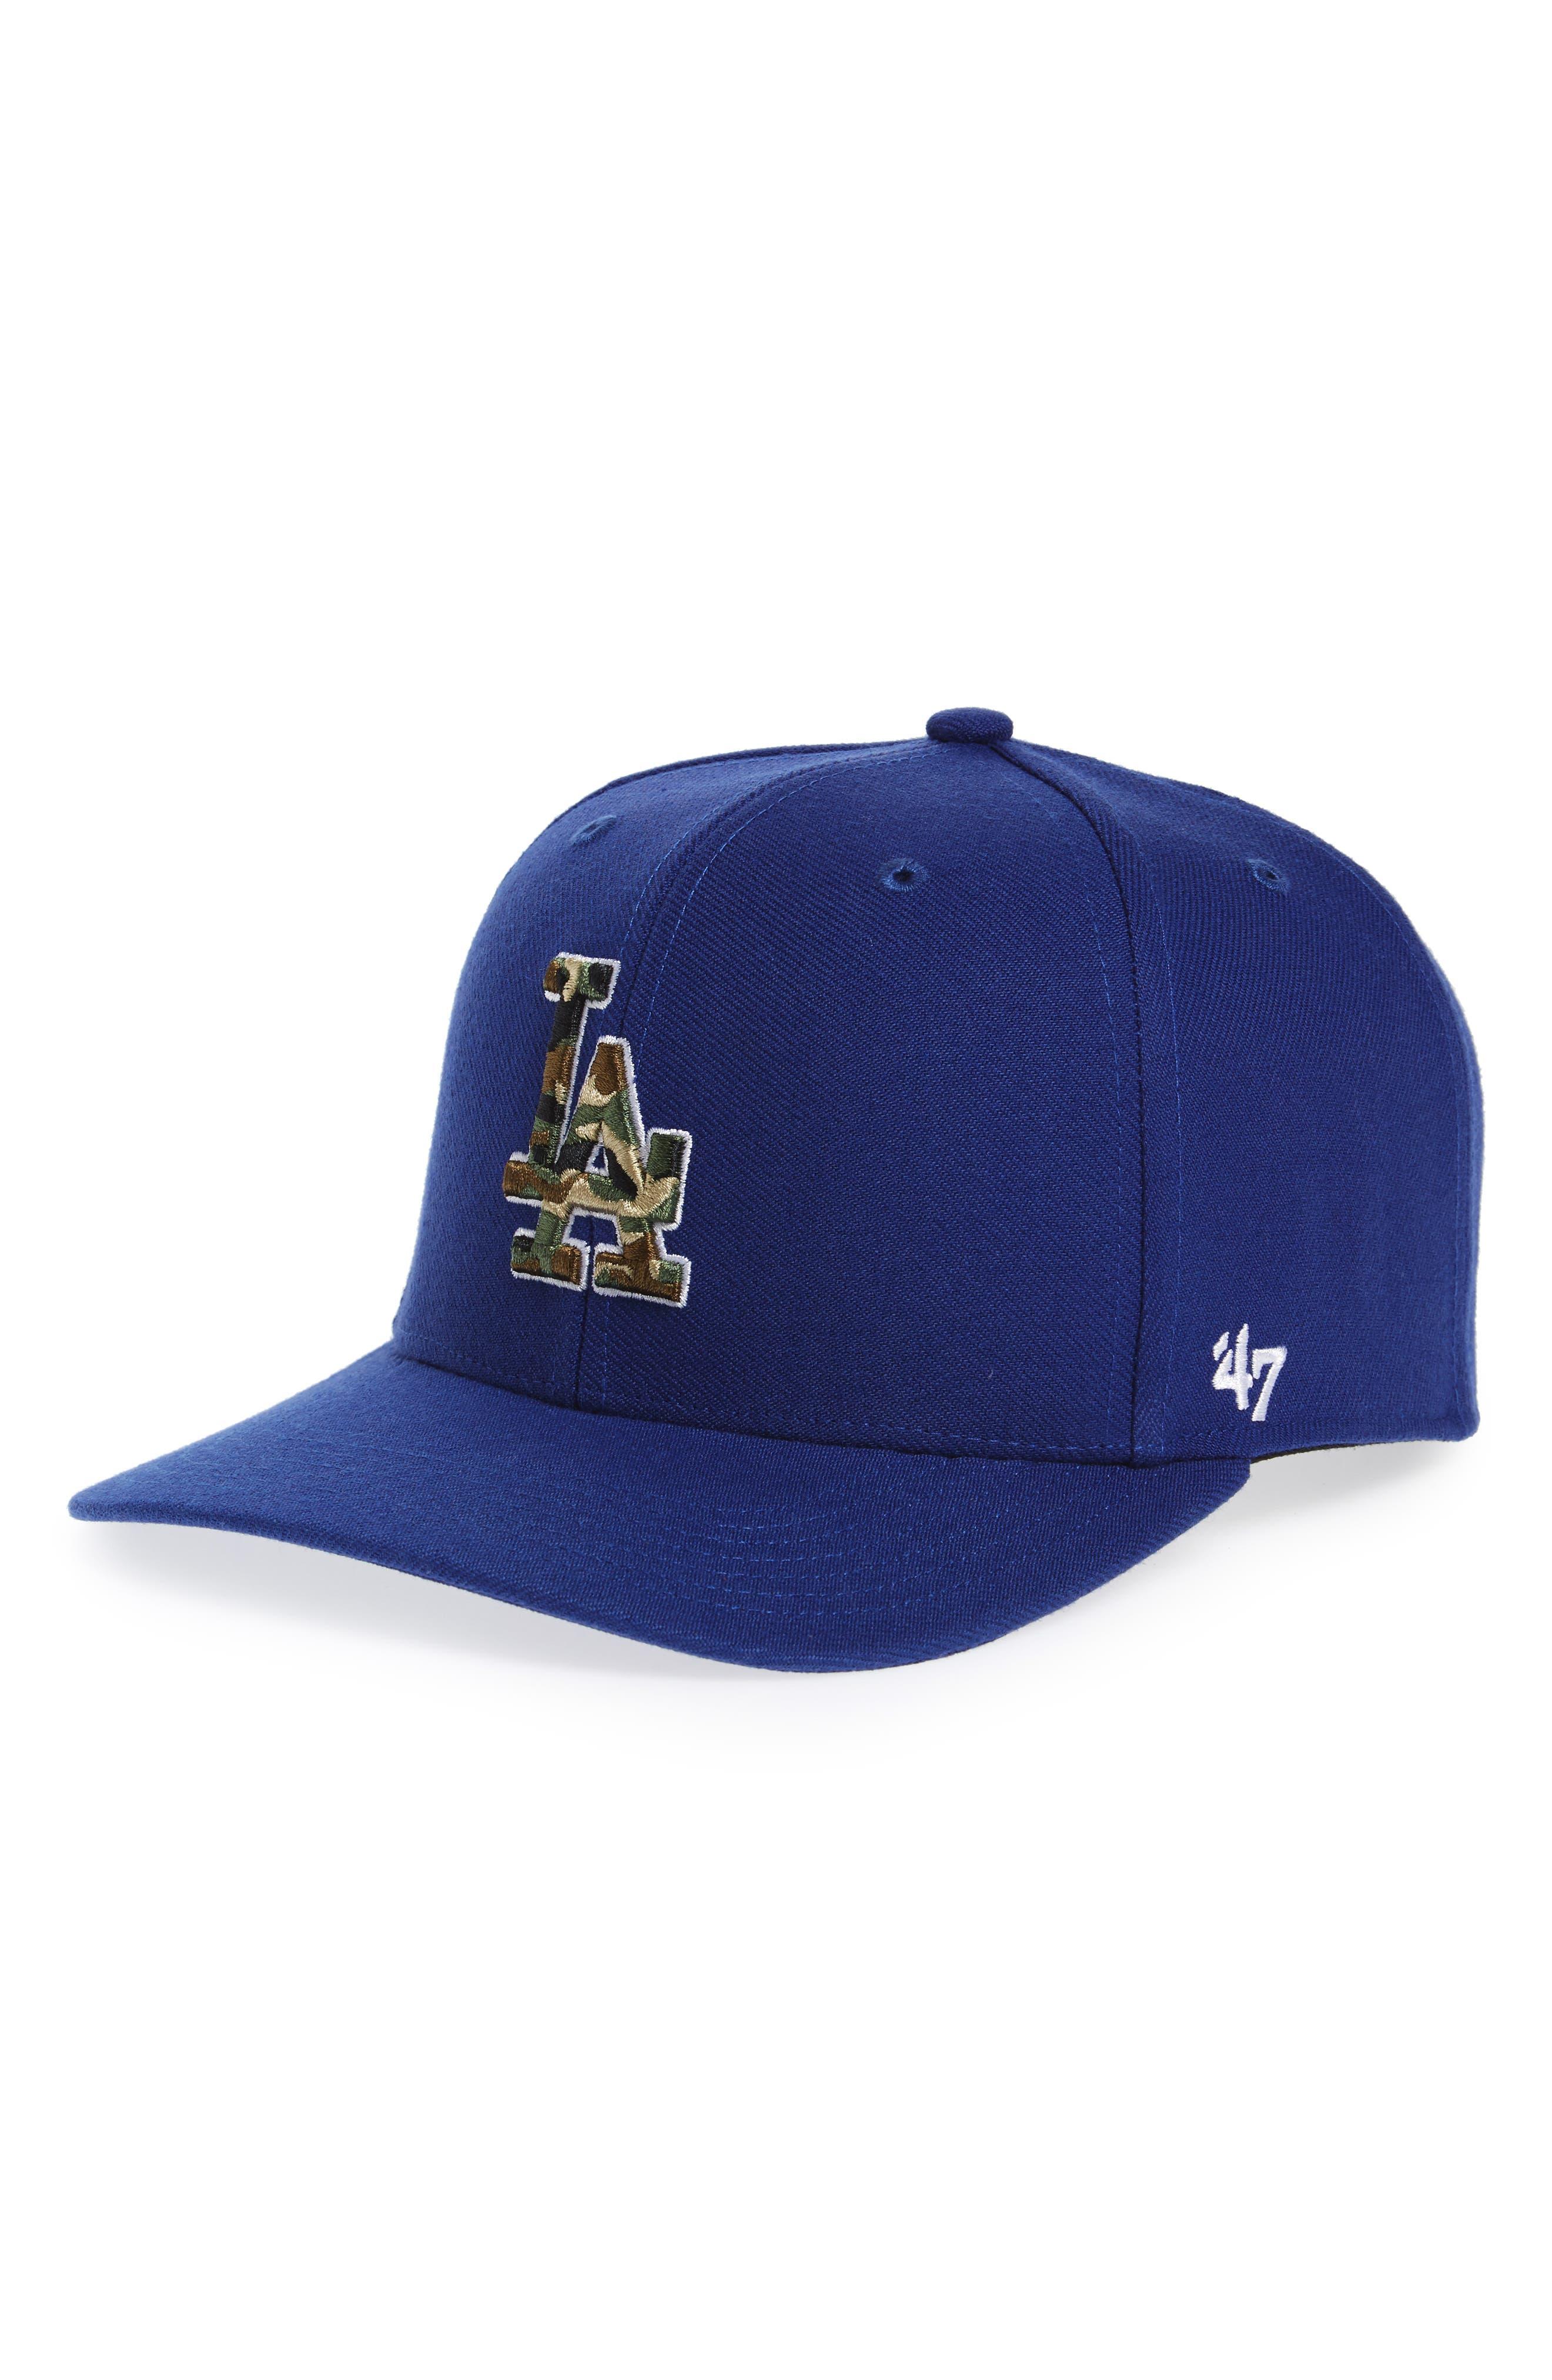 Los Angeles Dodgers - Camouflage Baseball Cap,                         Main,                         color, Royal